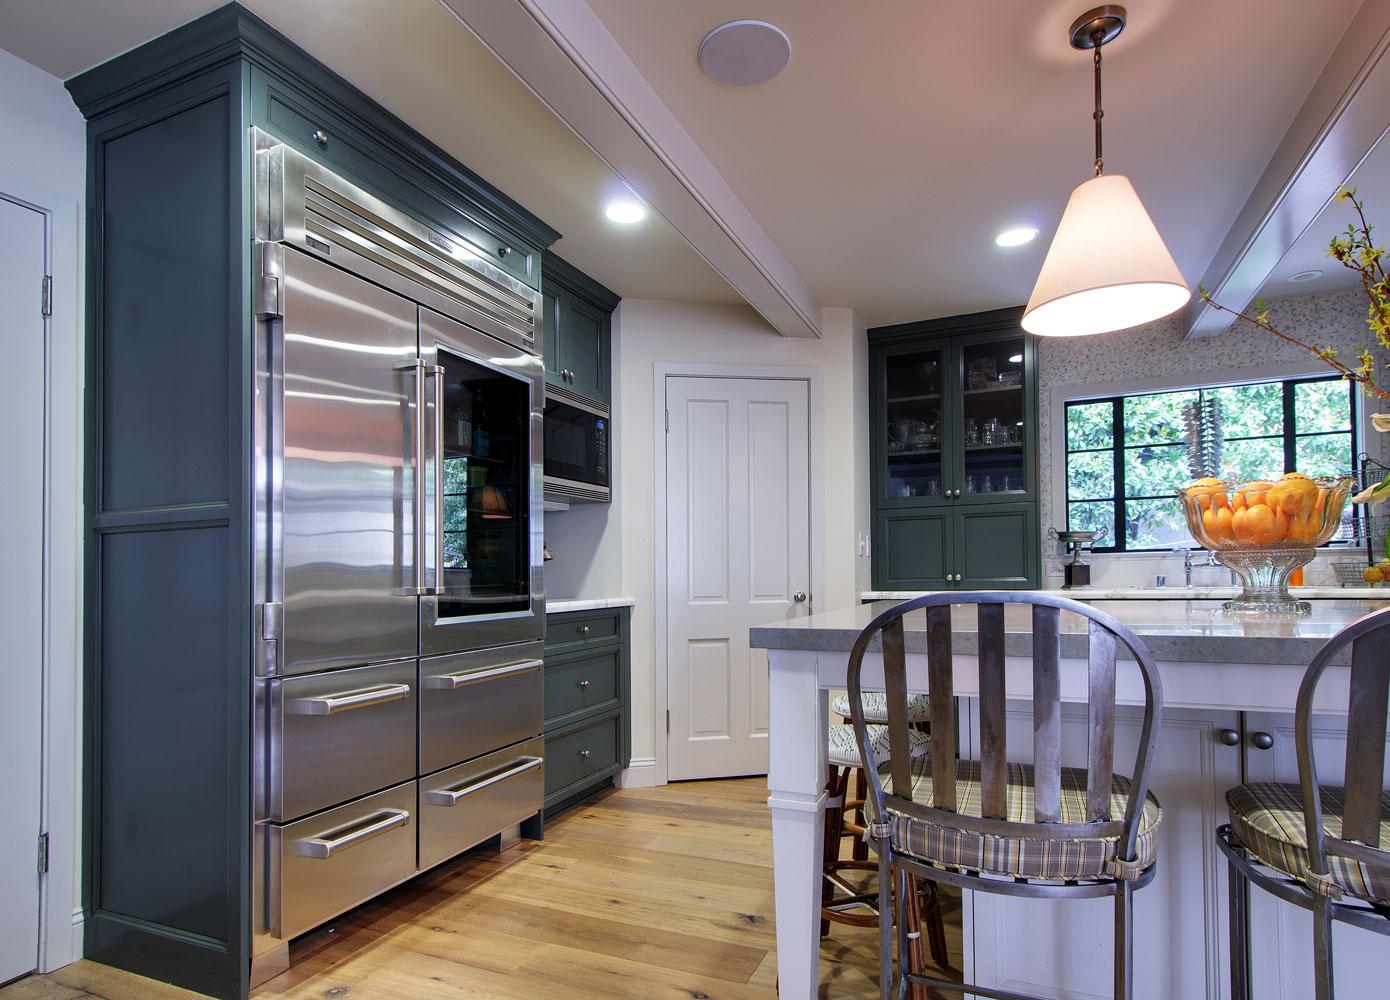 island-chelsea-kitchen-modern-appliances.jpg